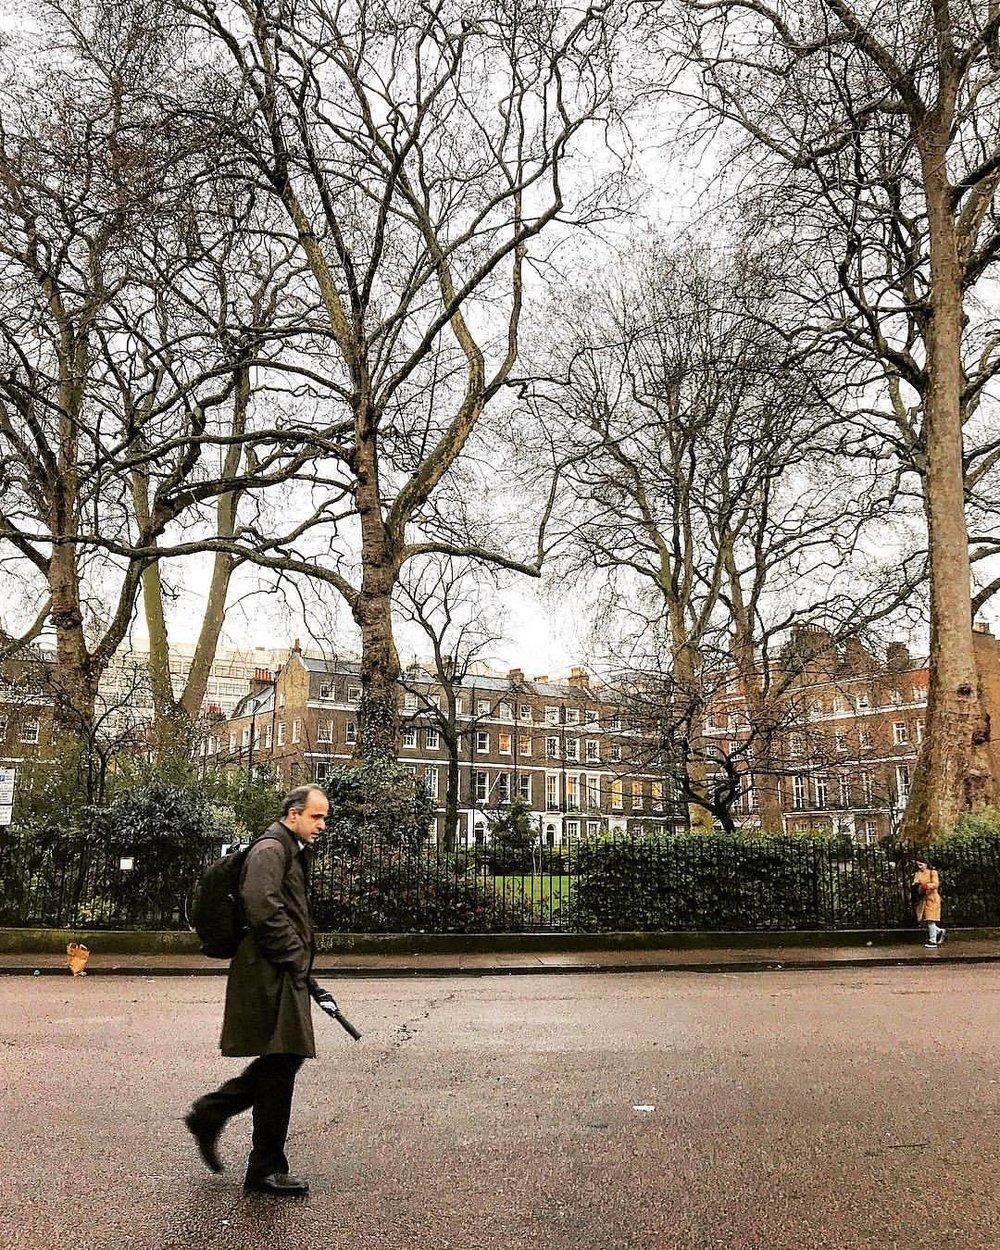 """No winter lasts forever; no spring skips its turn.""  Hal Borland (1900-1978), American author and naturalist   -  #unitedkingdom #england #london #bringyourumbrella  (at Marylebone London)"